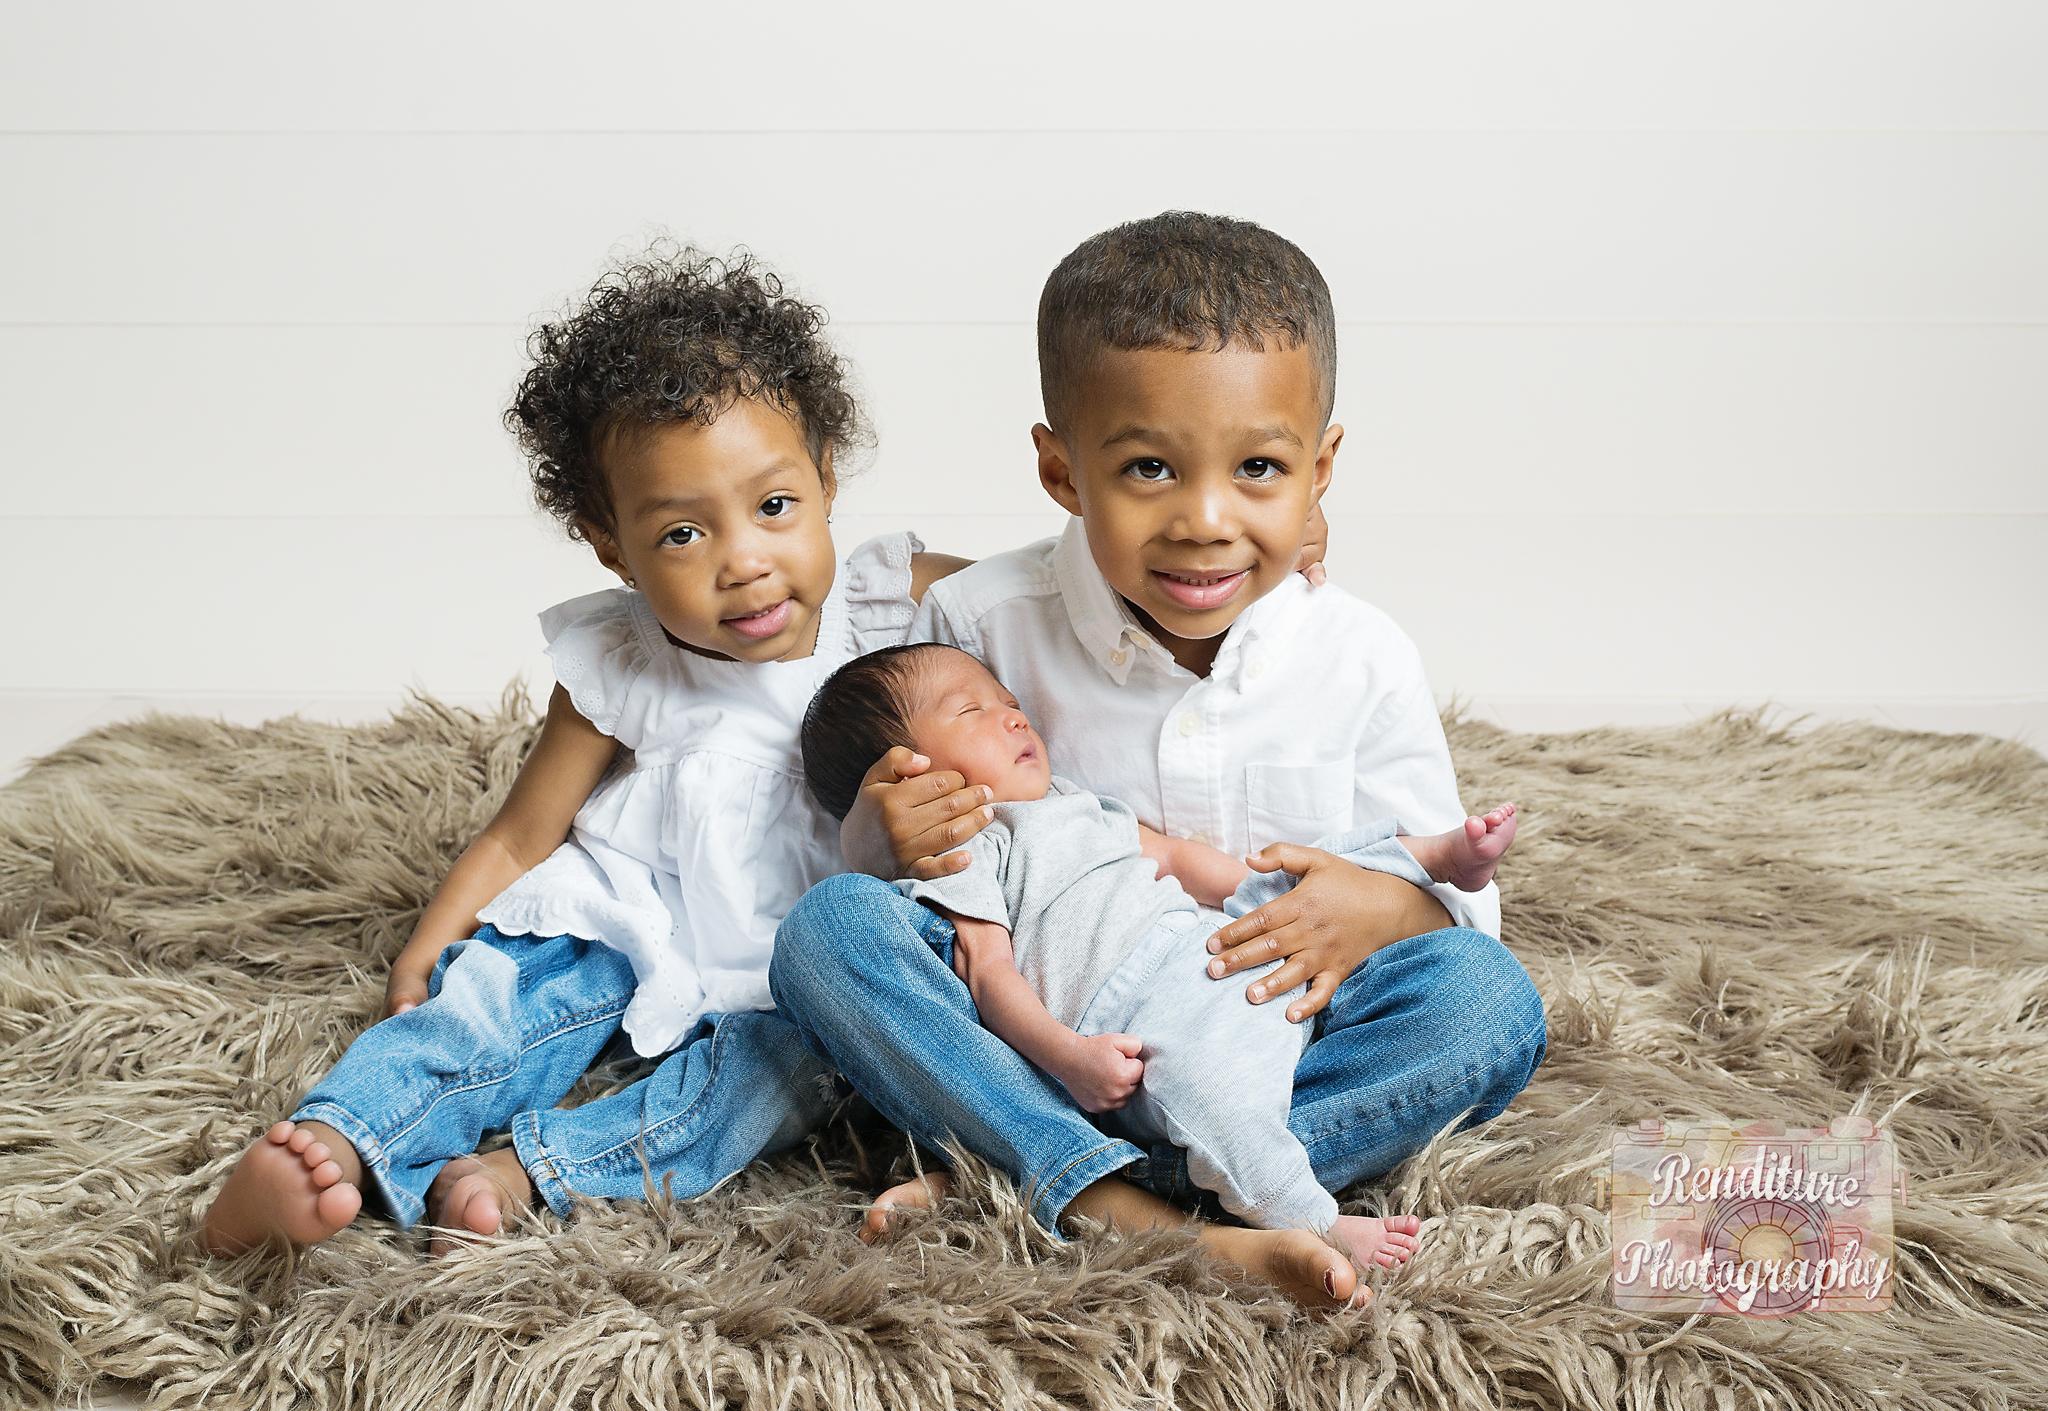 Saskatoon-Newborn-Family-Renditure-Baby-Photography-Photographer-Maternity-Pregnancy-Saskatchewan-389 FBR.jpg